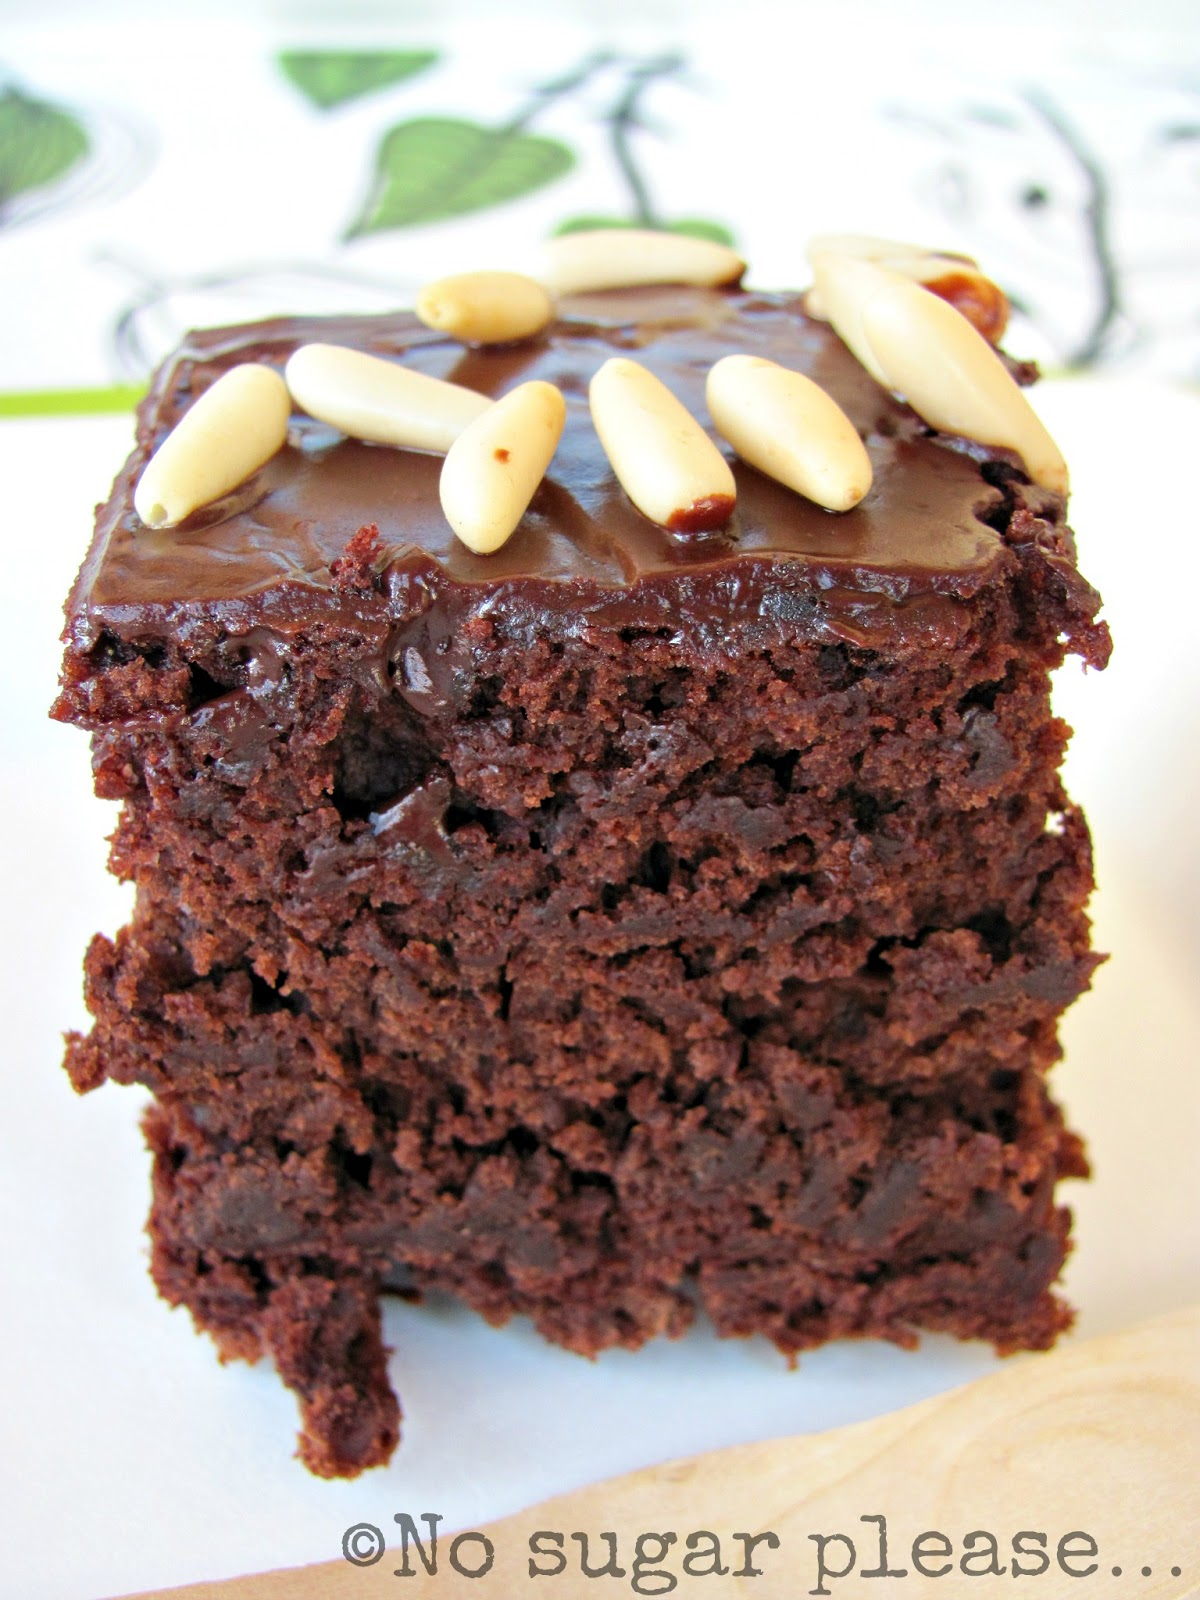 Ricette dolci al cucchiaio per diabetici